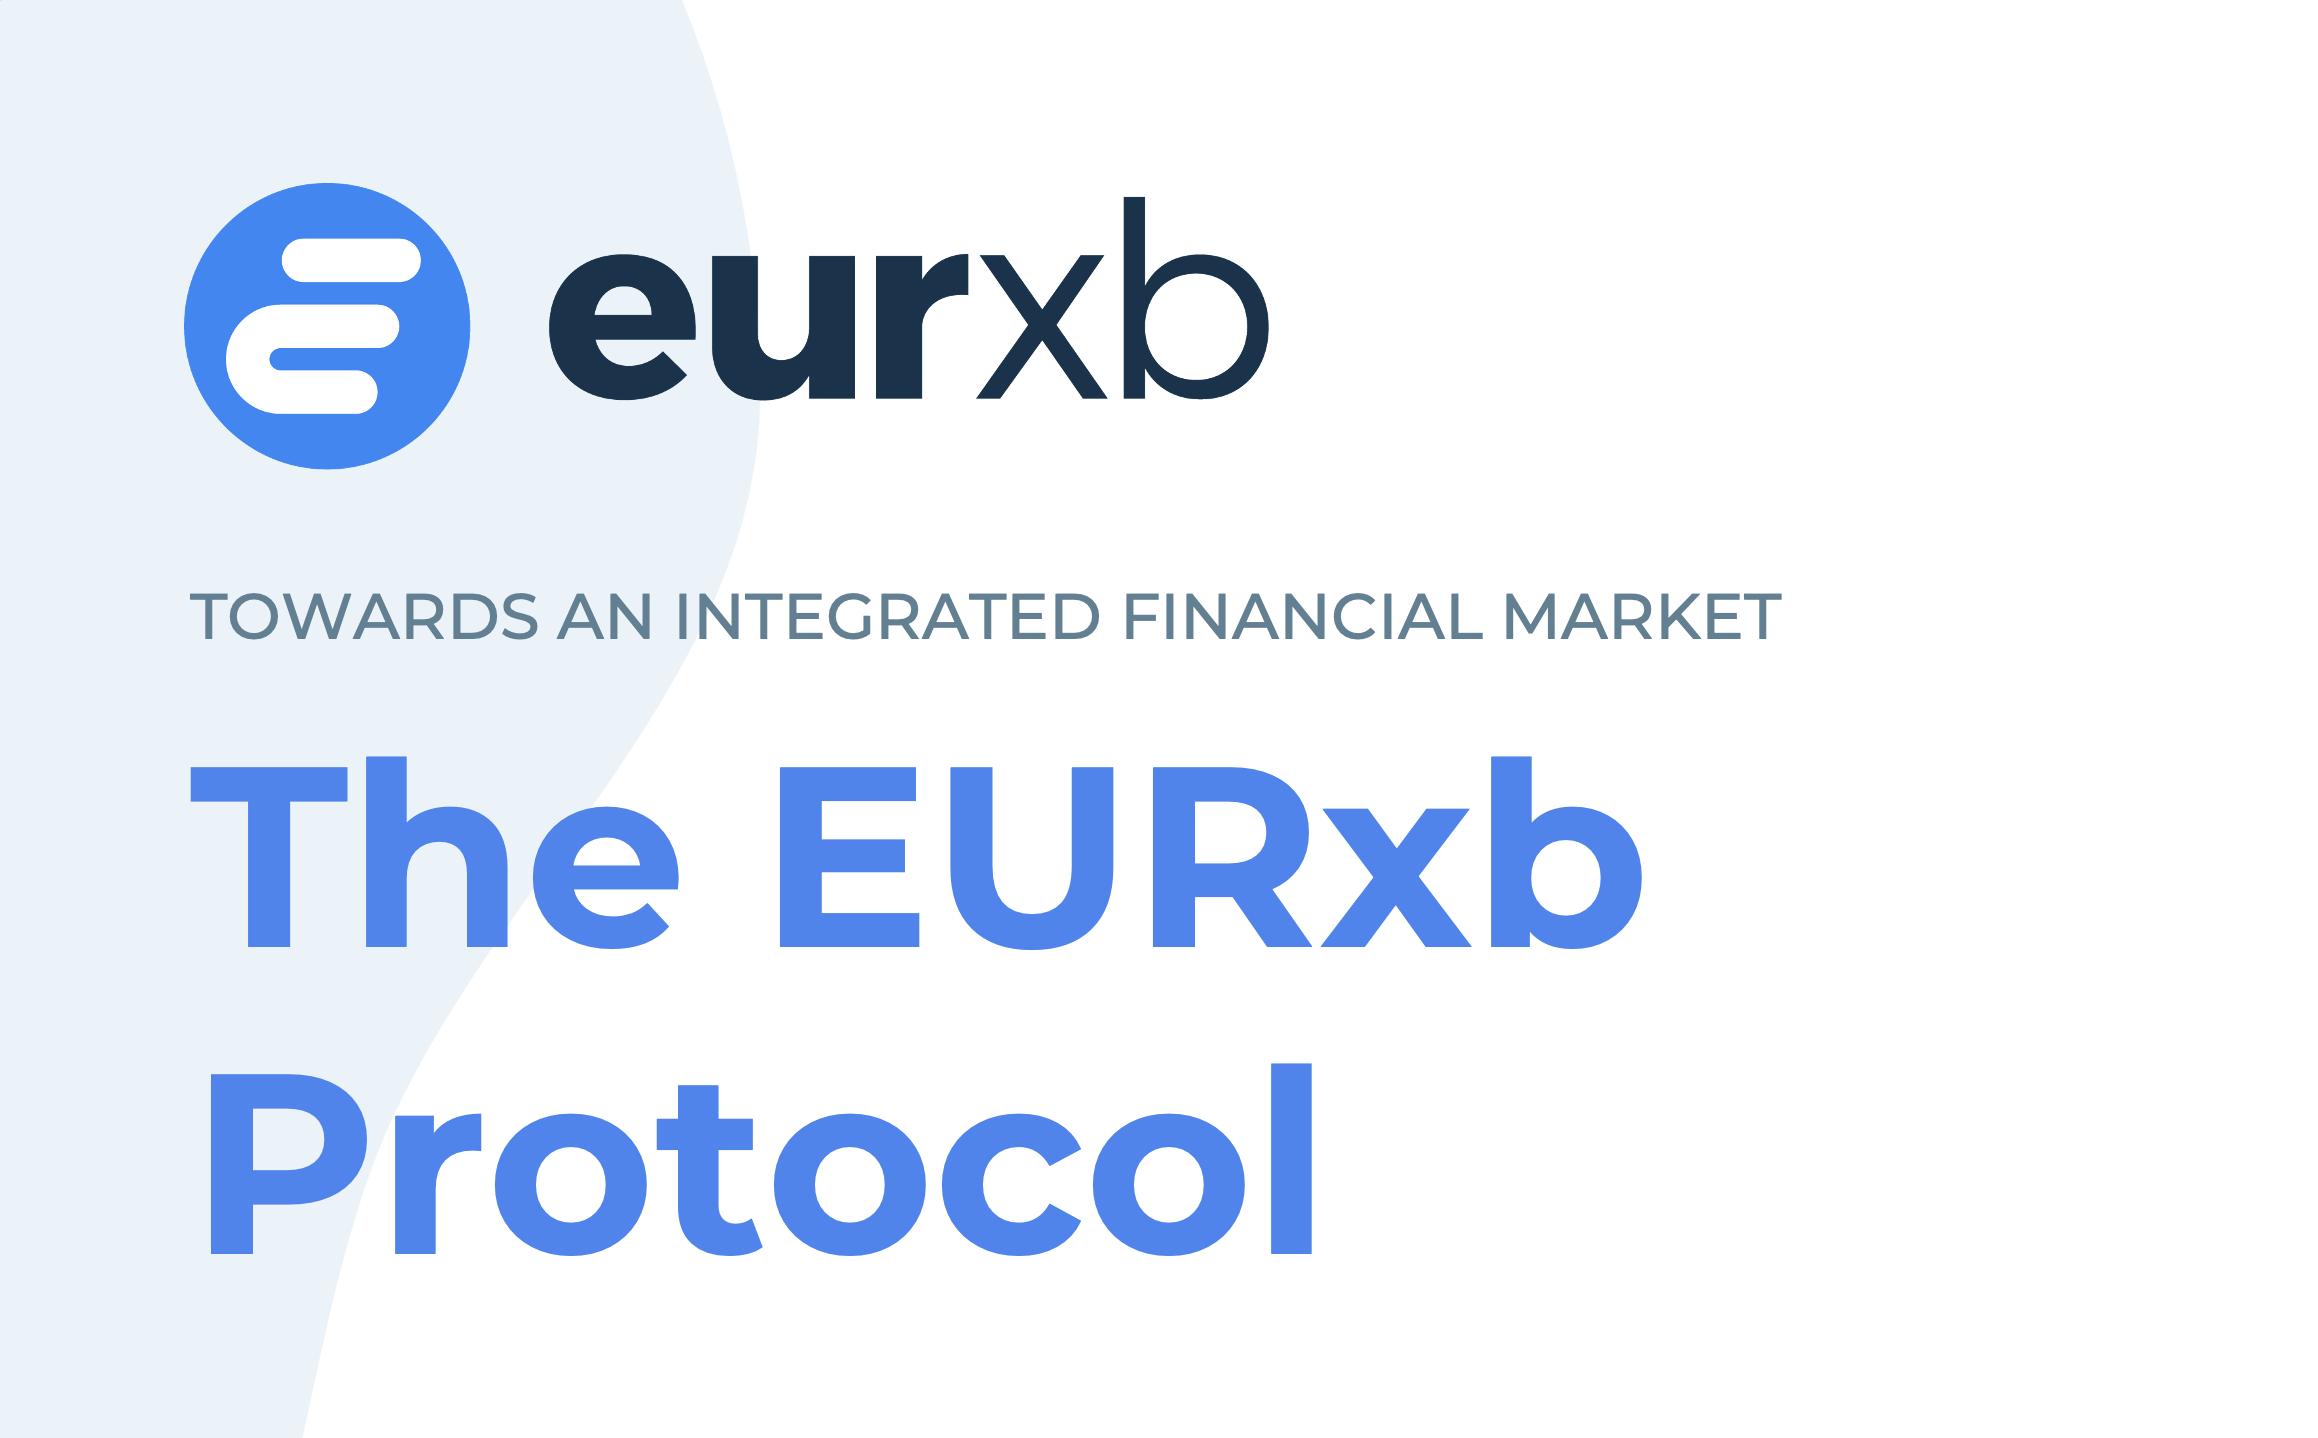 Towards an Integrated Financial Market